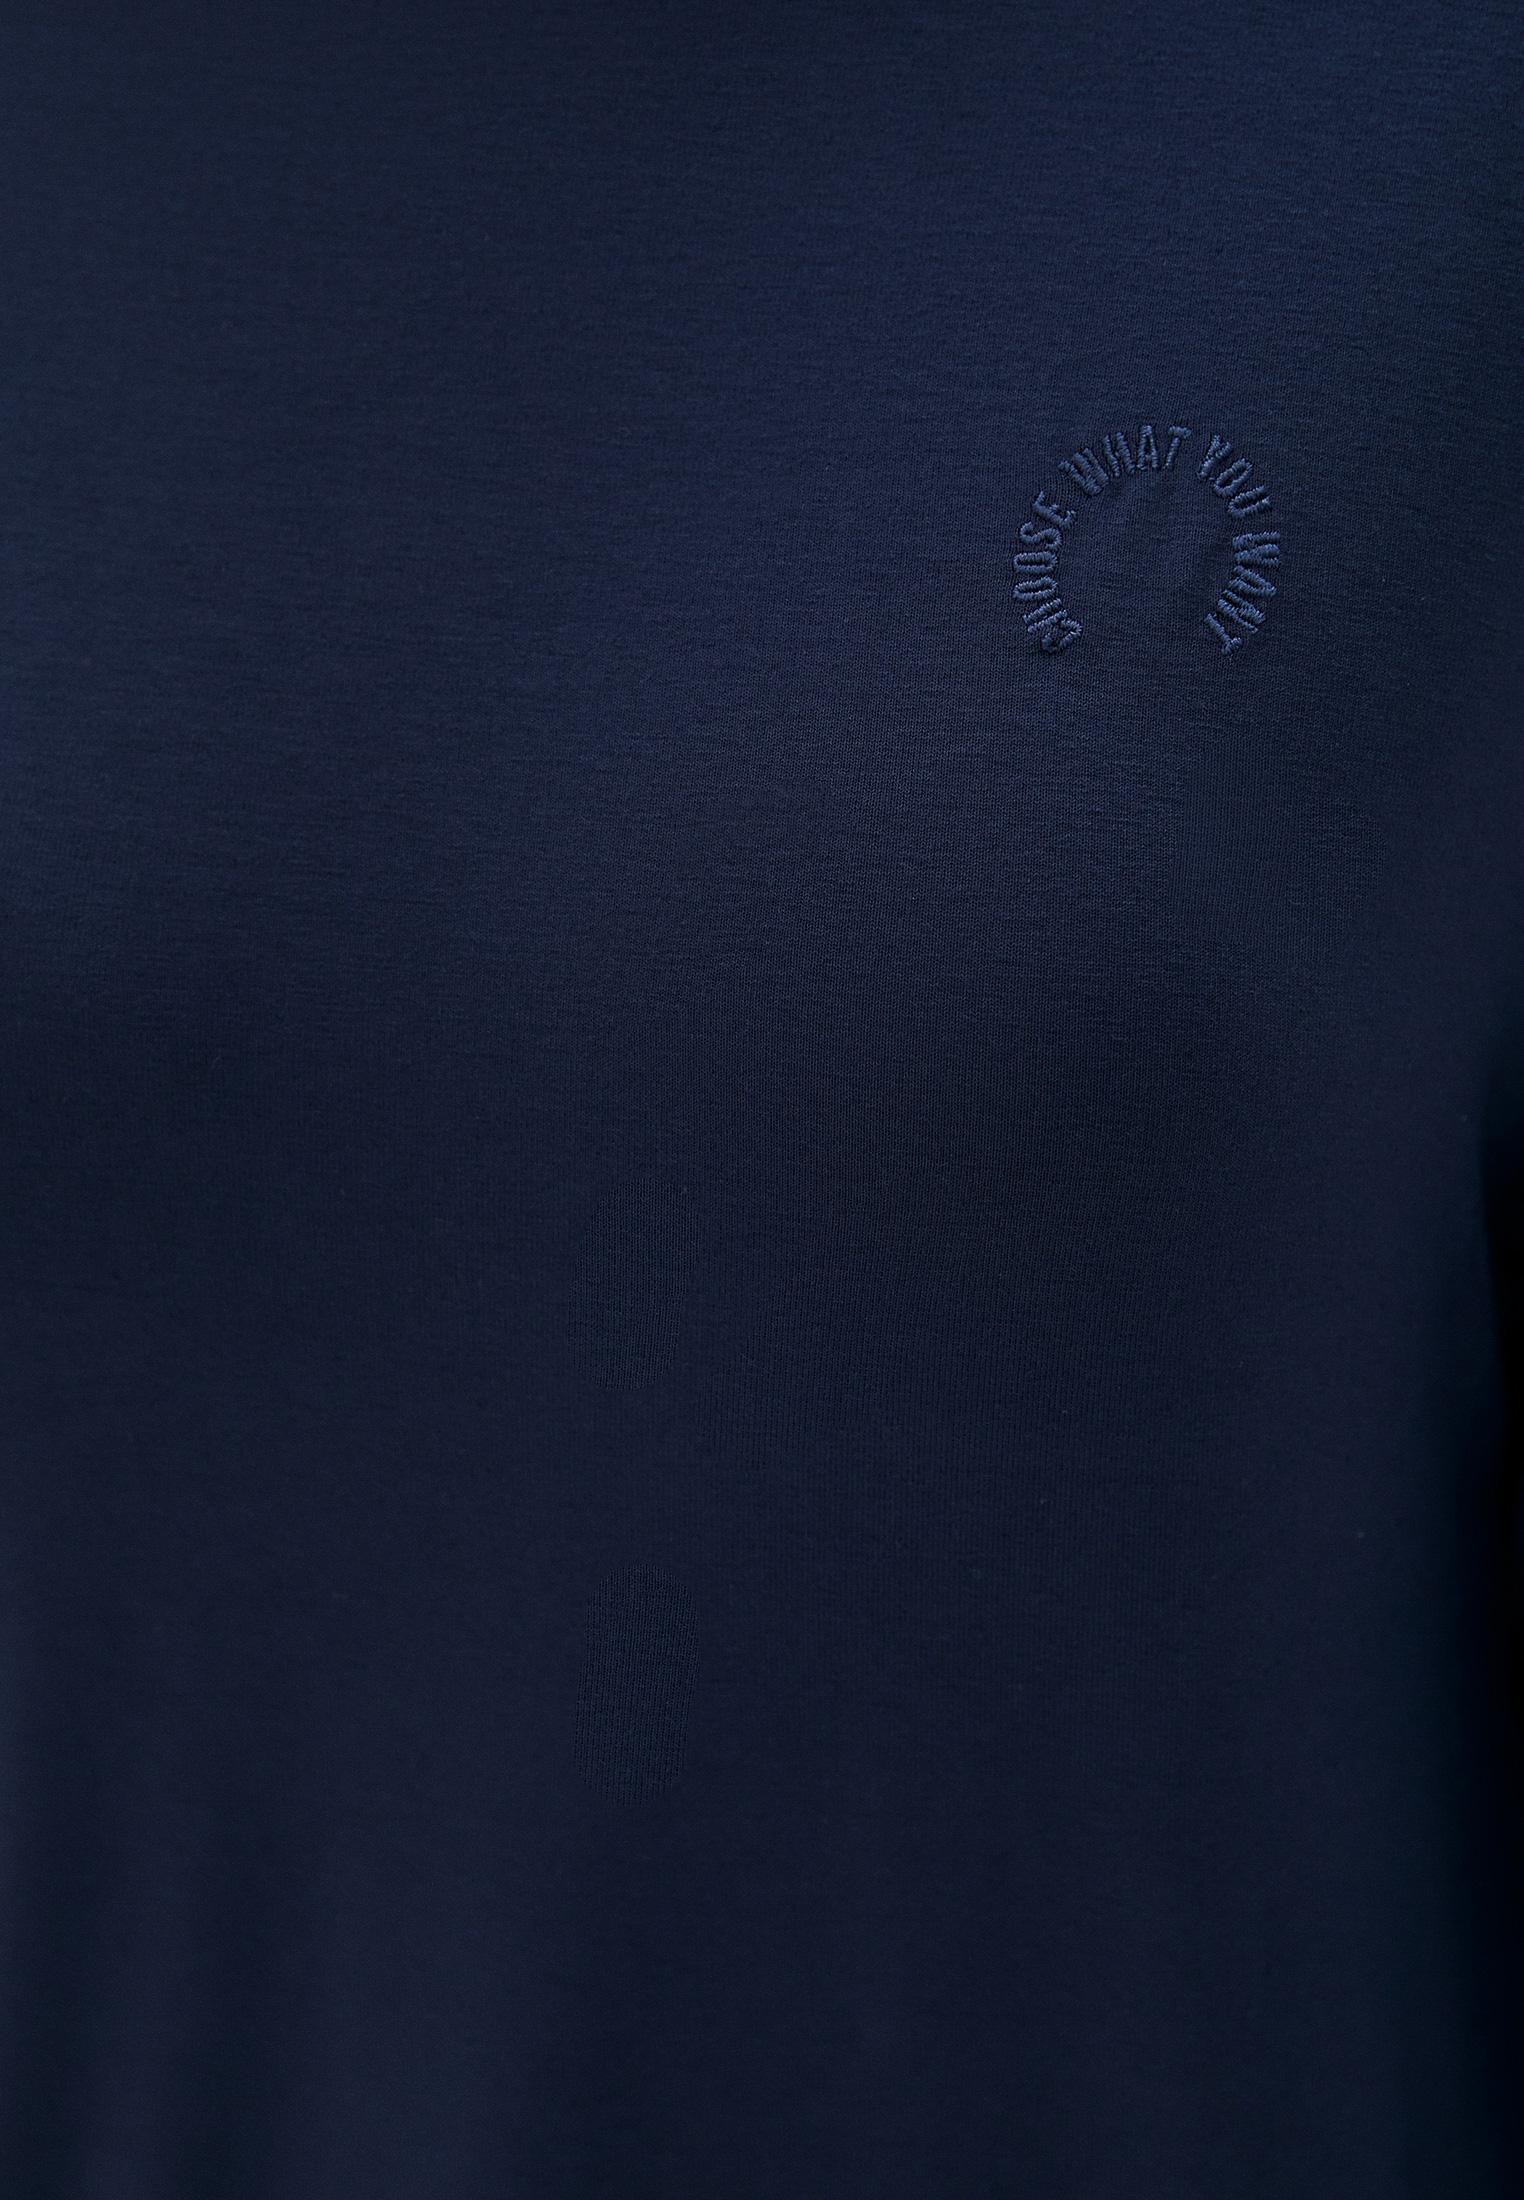 Блуза Betty & Co 2473/3239: изображение 4